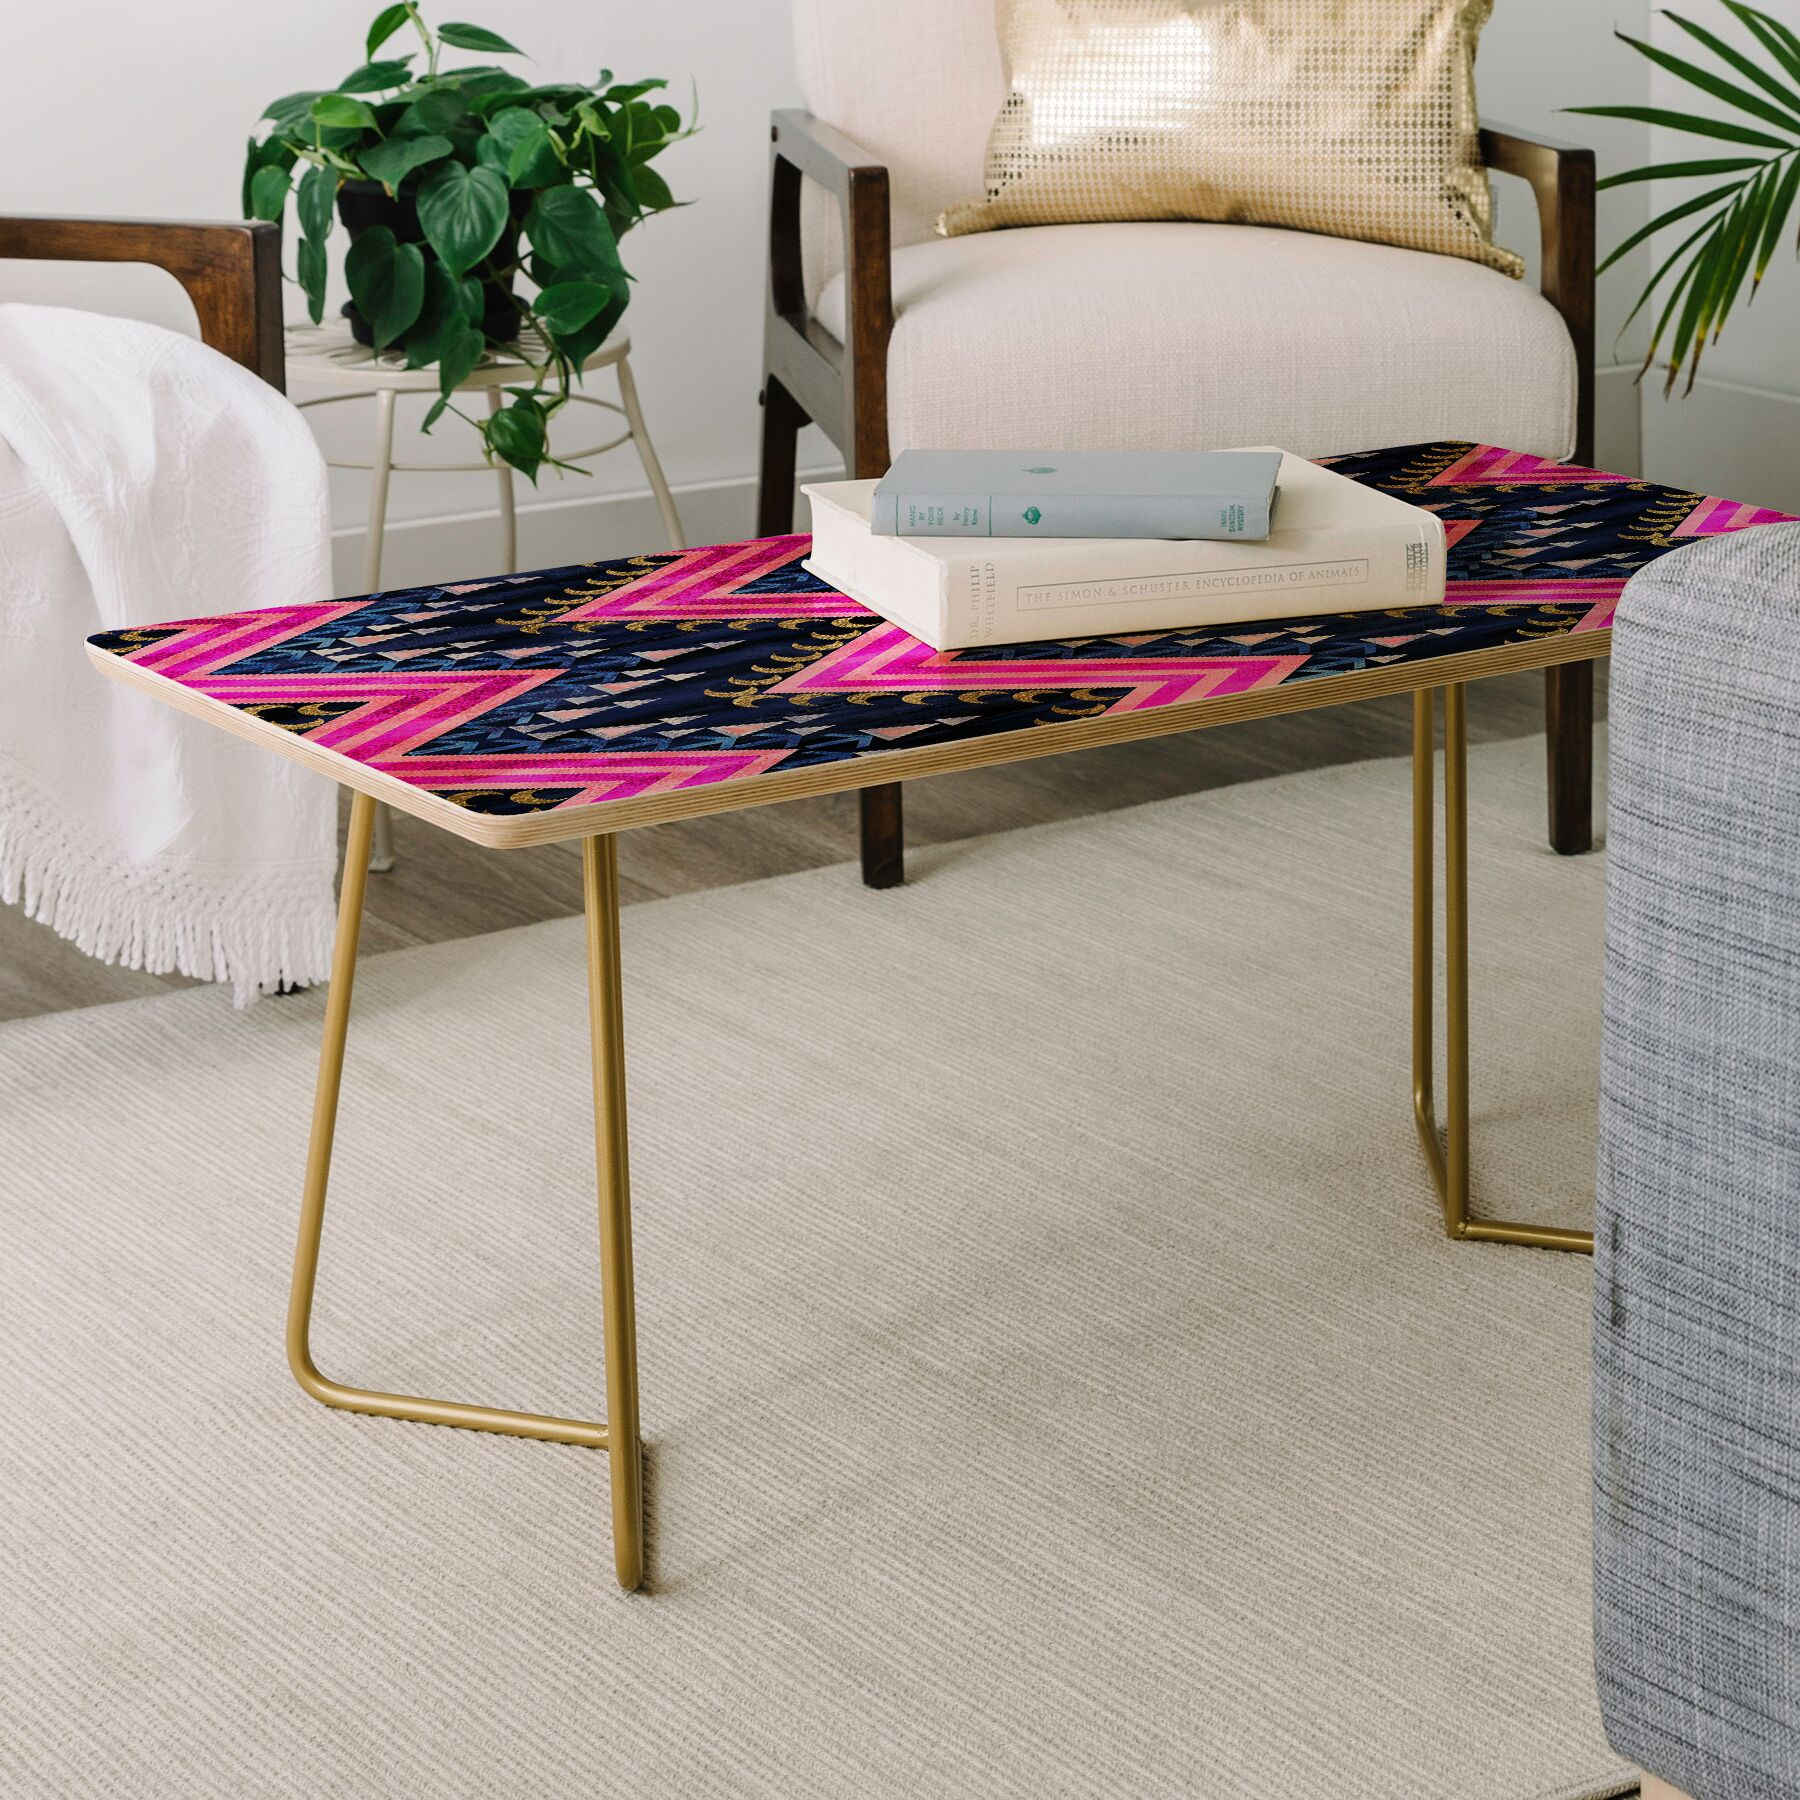 Schatzi Pena Chevron Coffee Table Color: Pink/Navy